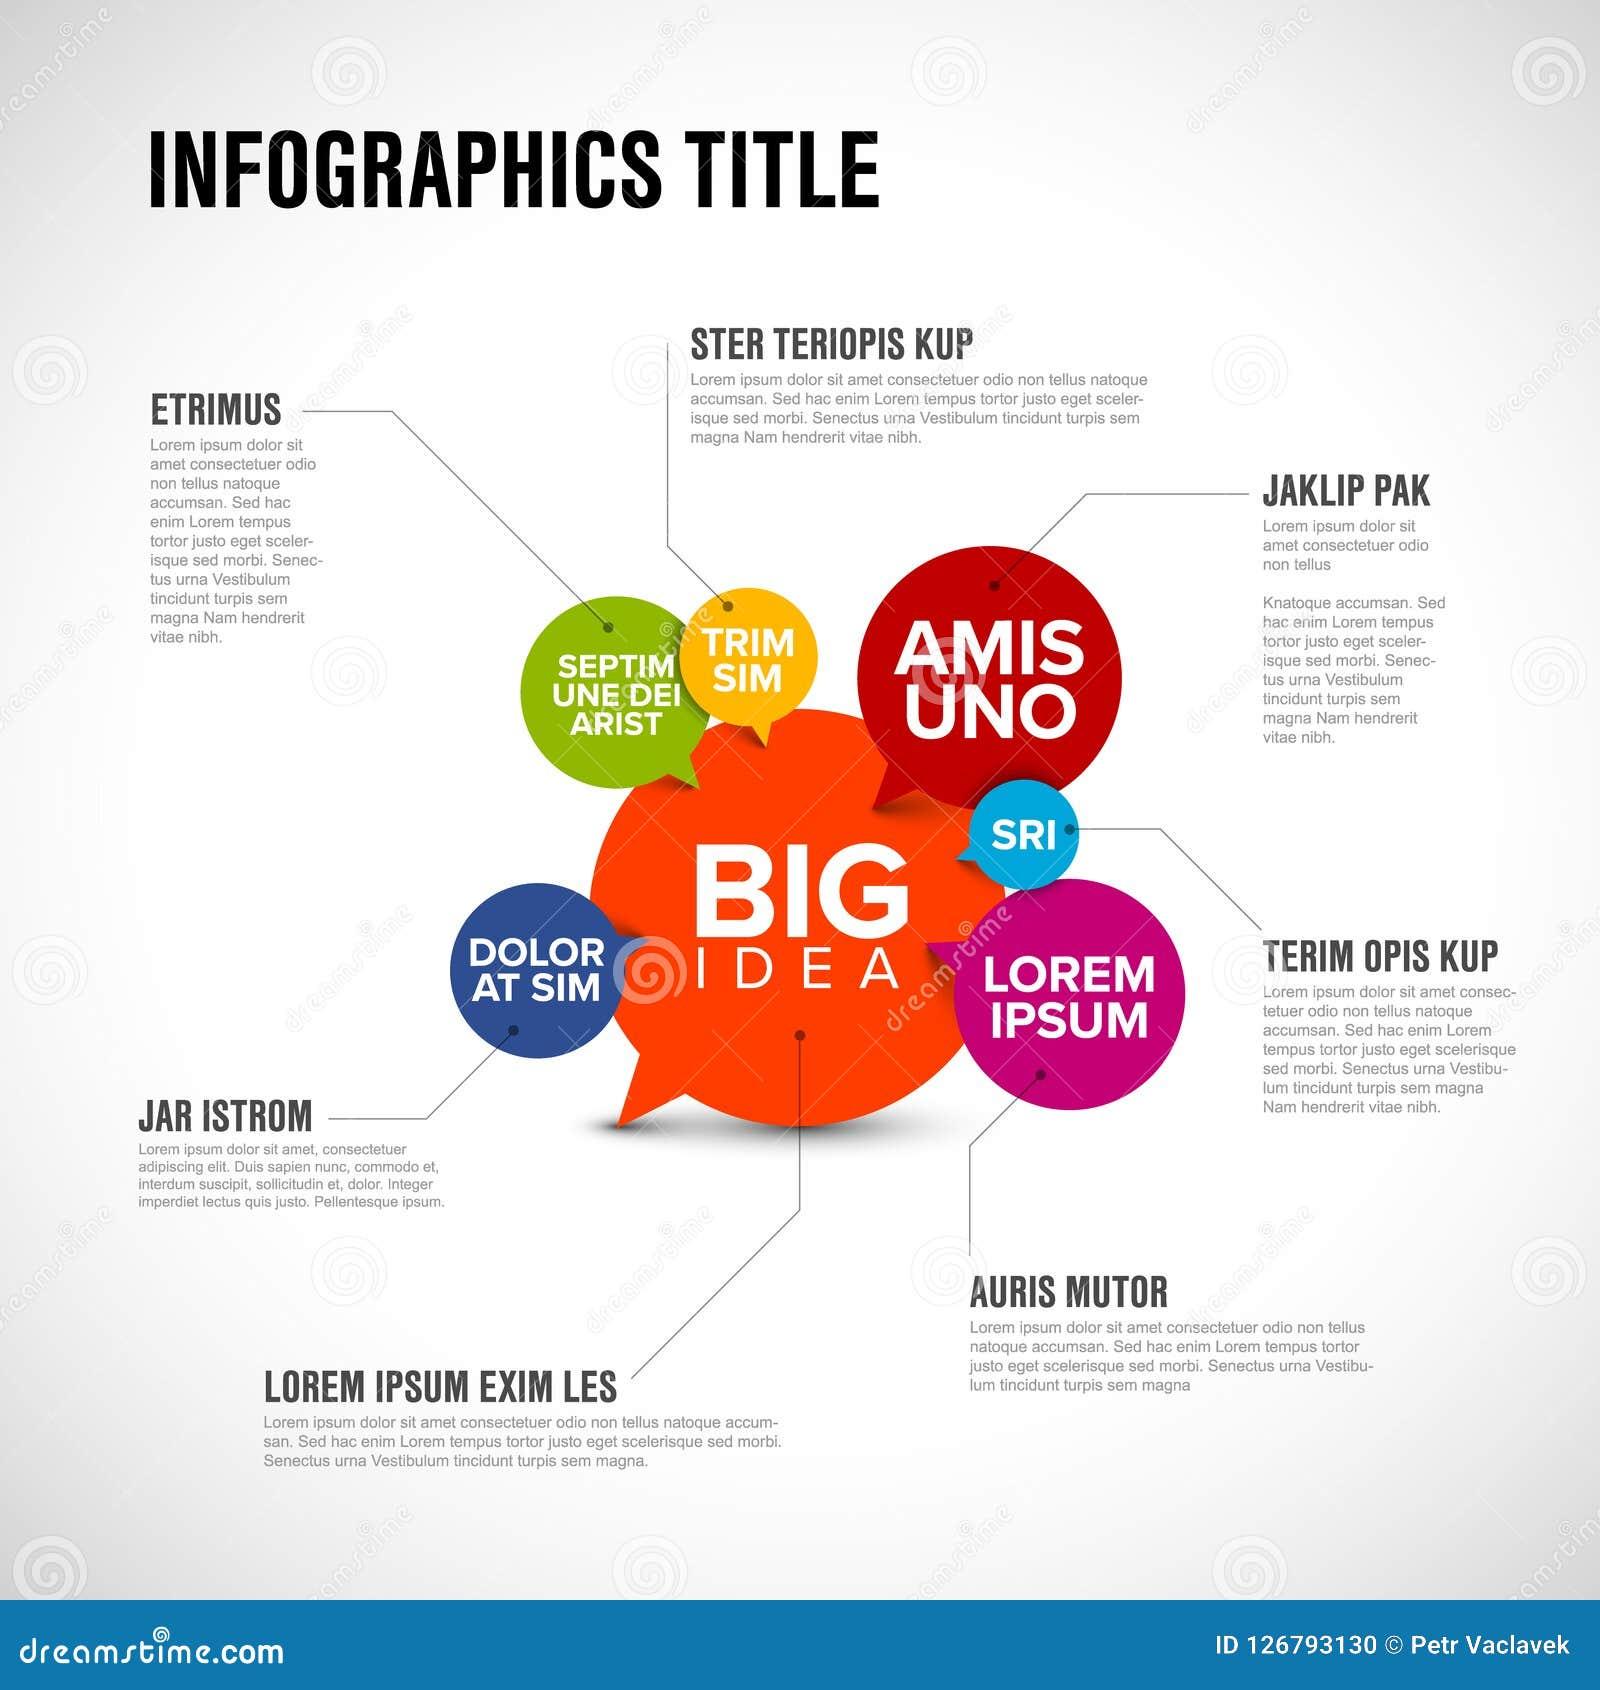 Big idea concept infographic